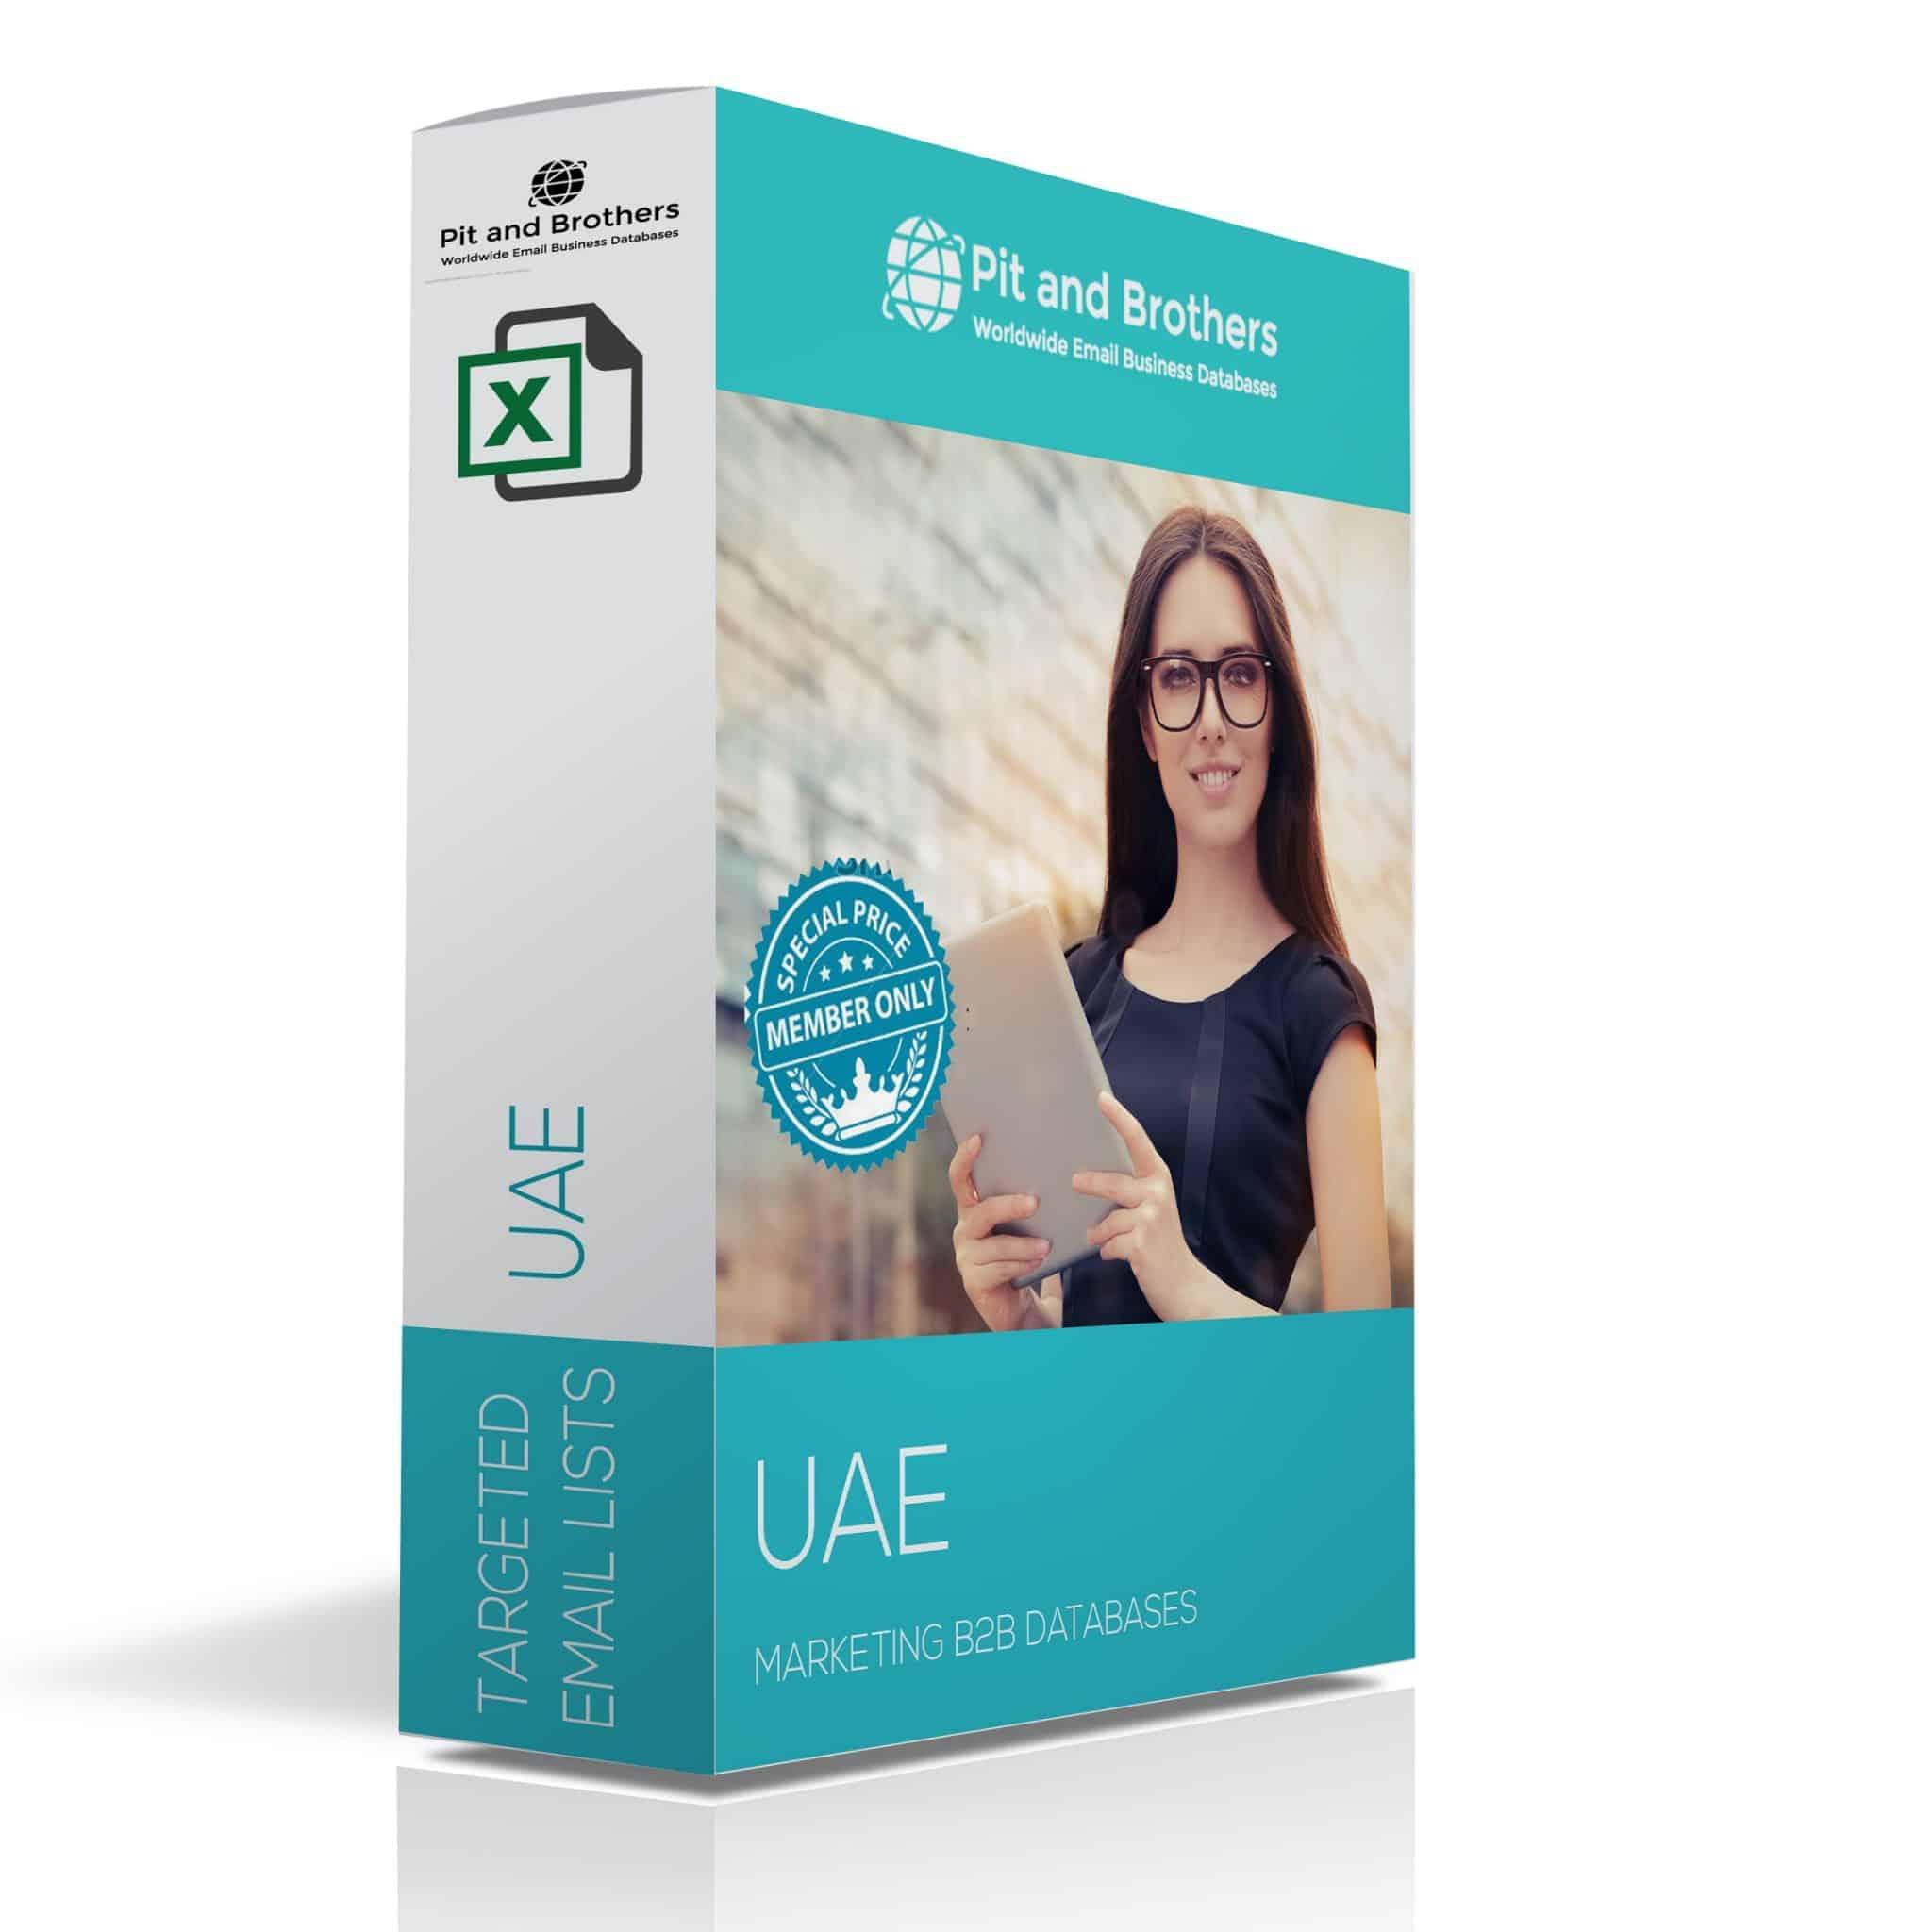 uae-companies